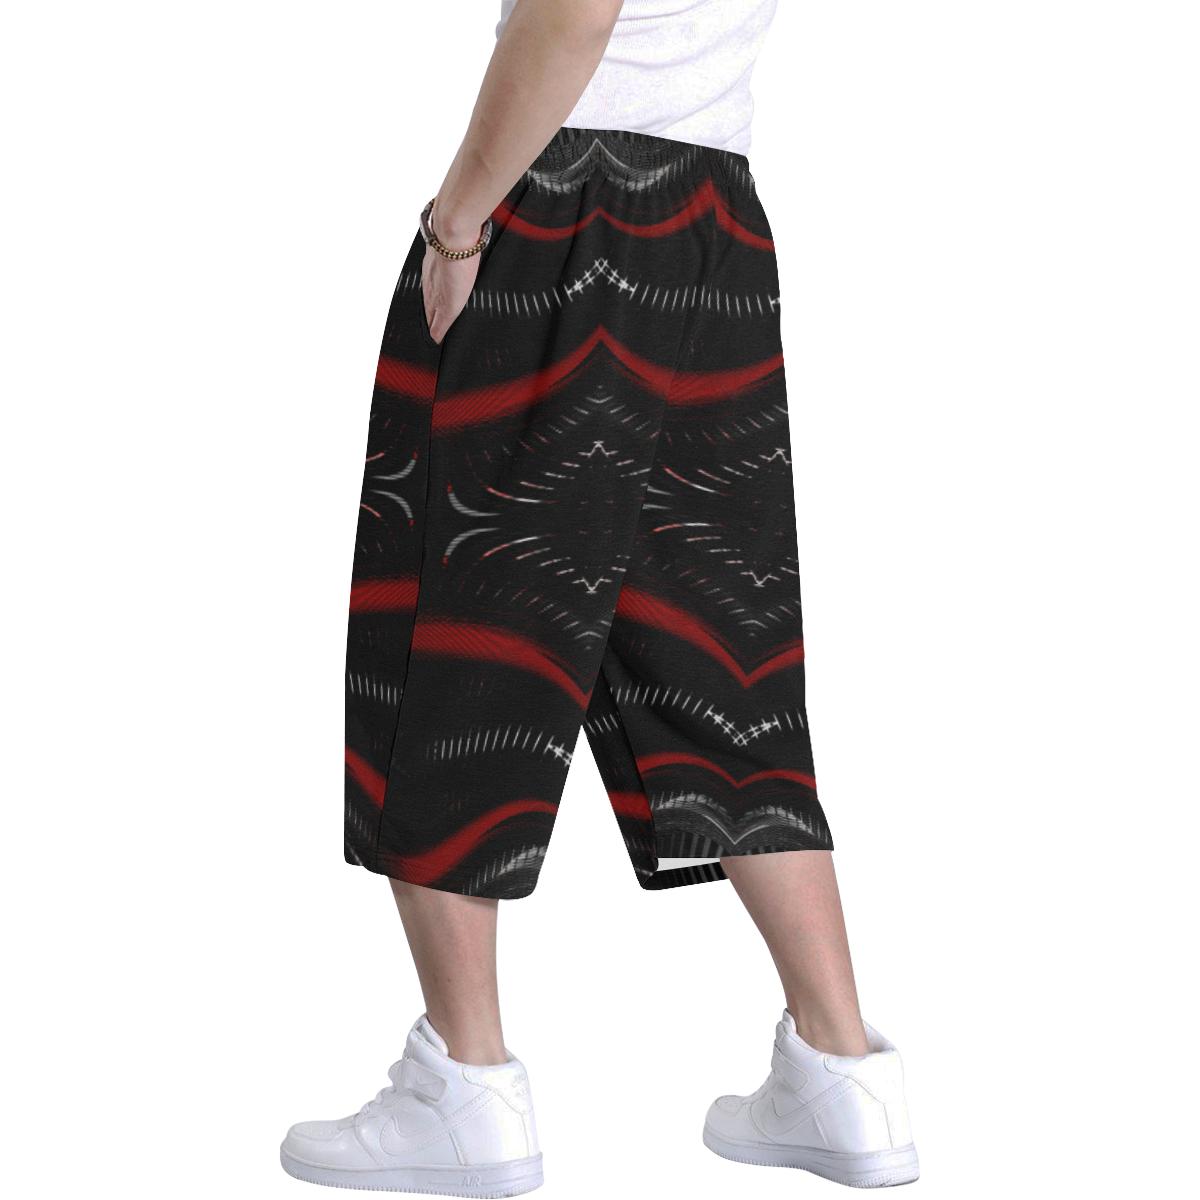 5000DUBLE 47 E 4 Men's All Over Print Baggy Shorts (Model L37)